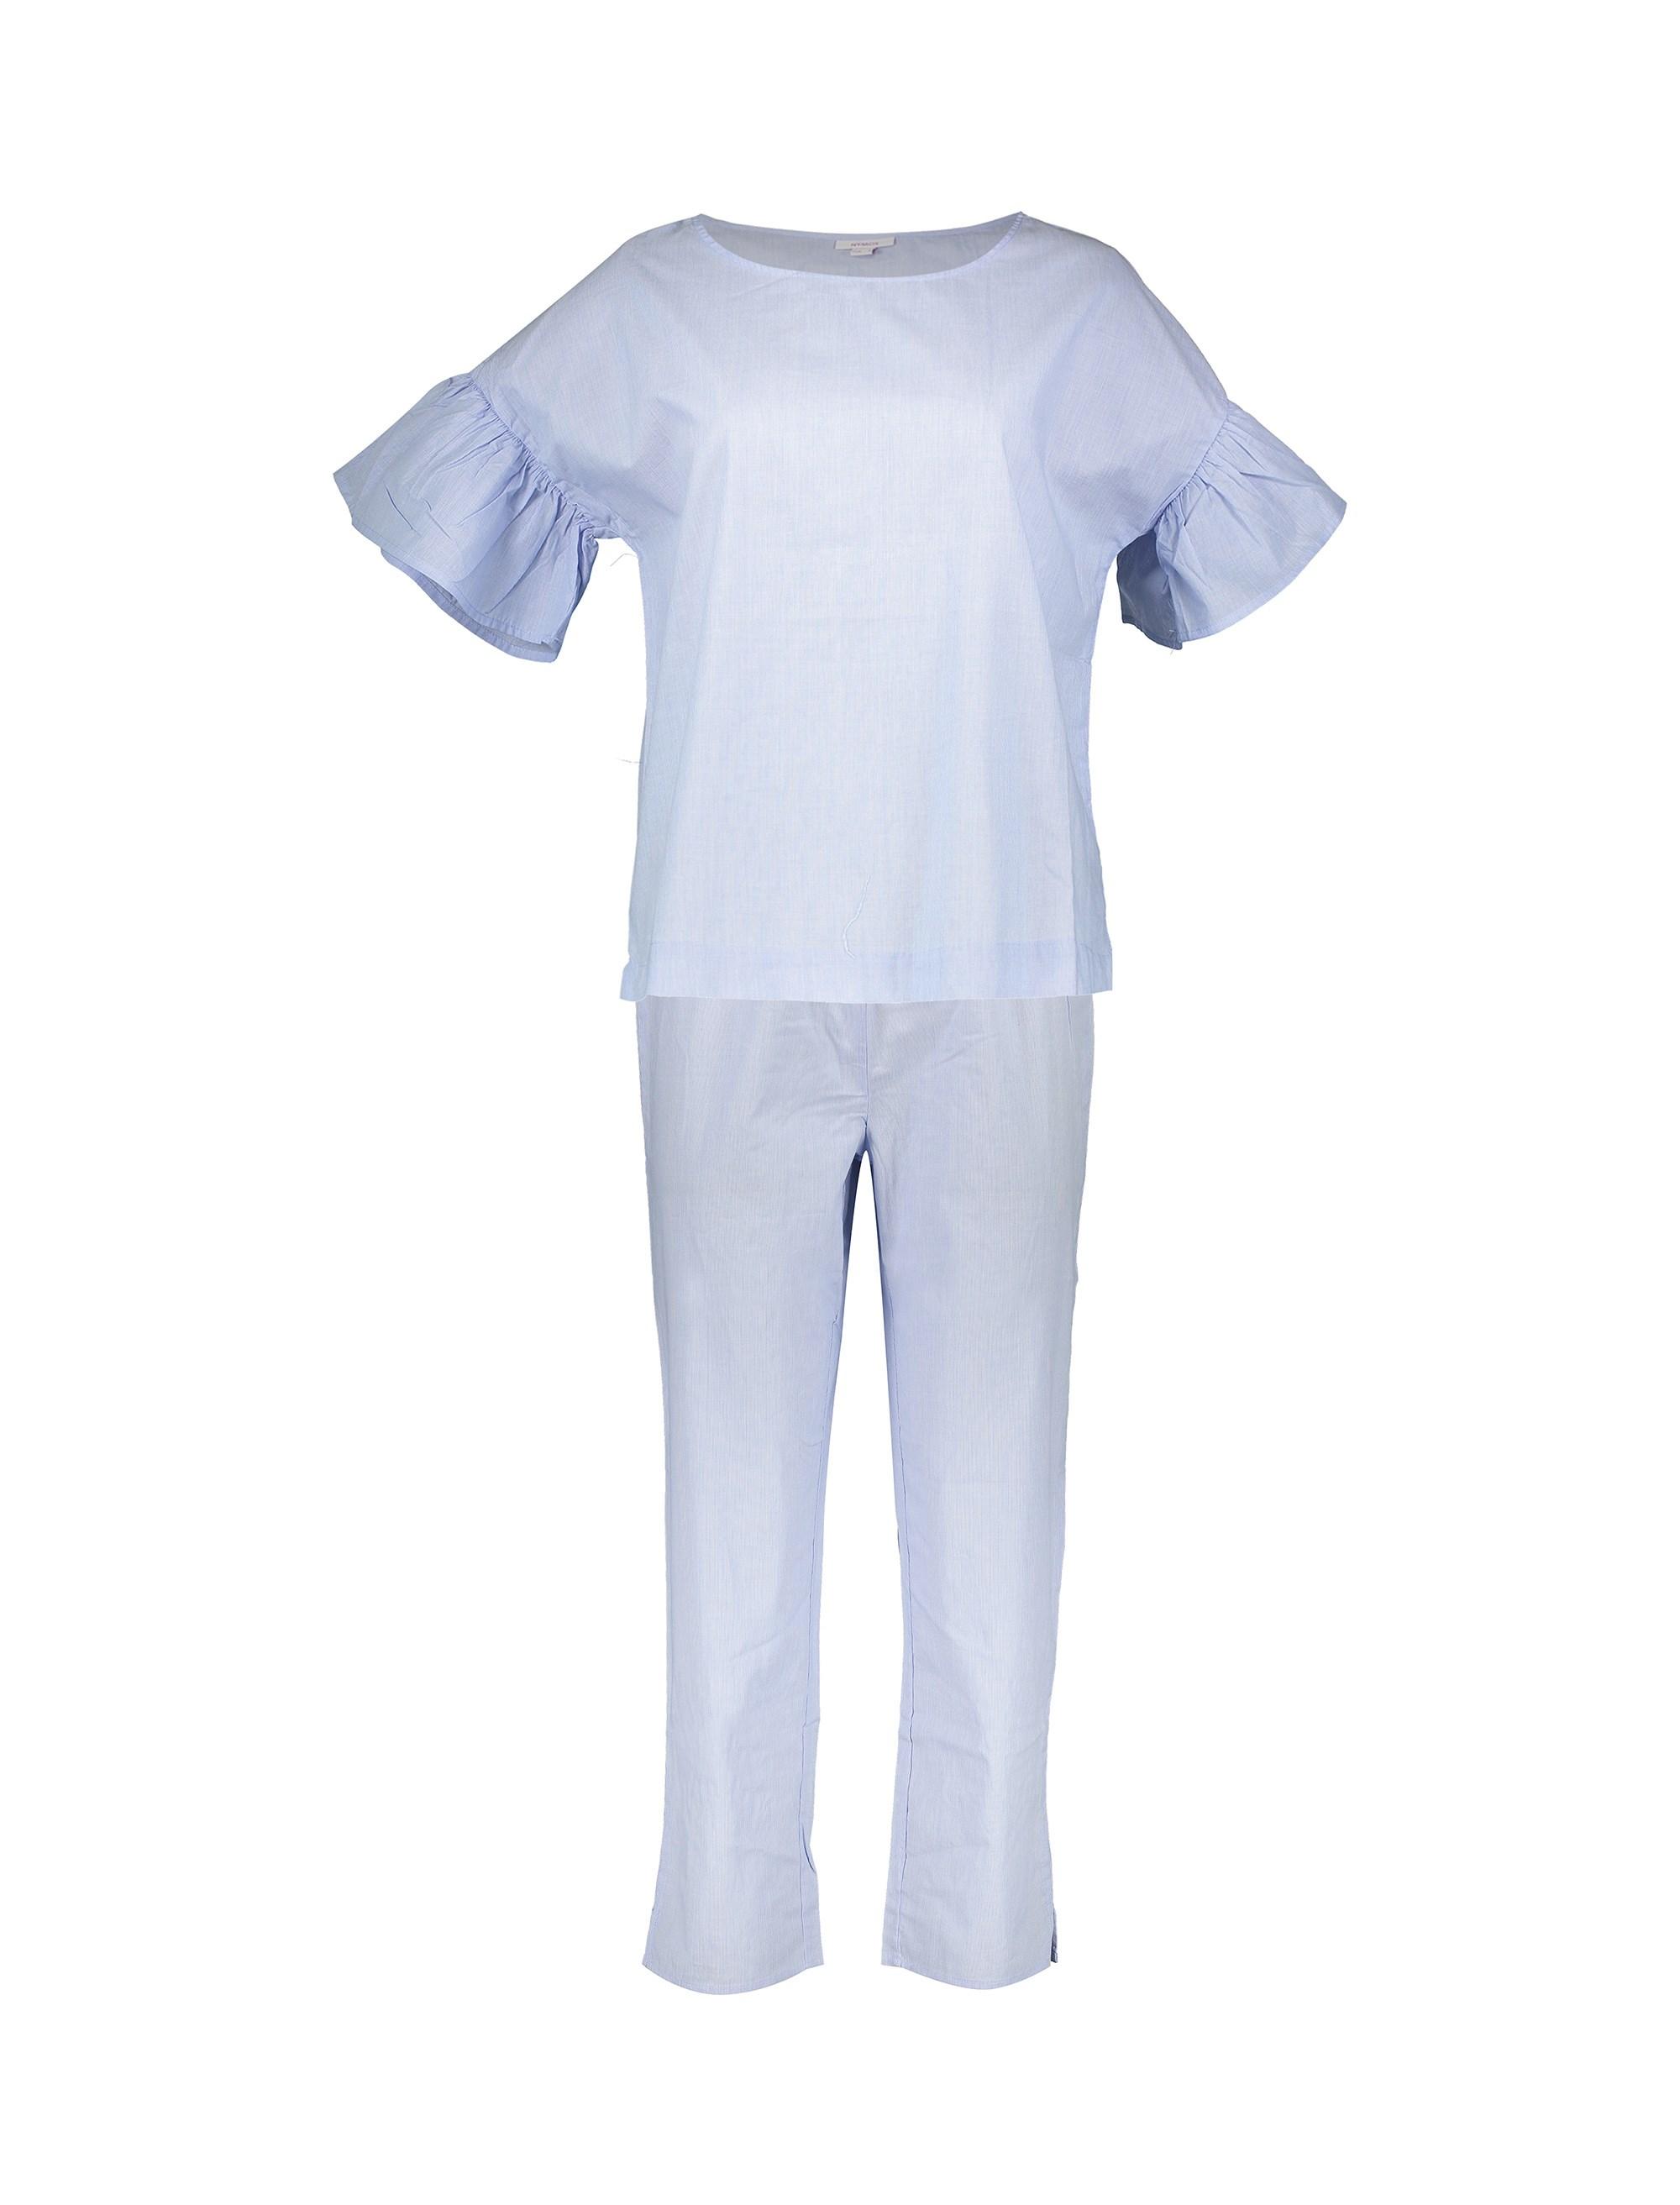 تی شرت و شلوار نخی زنانه - یوپیم